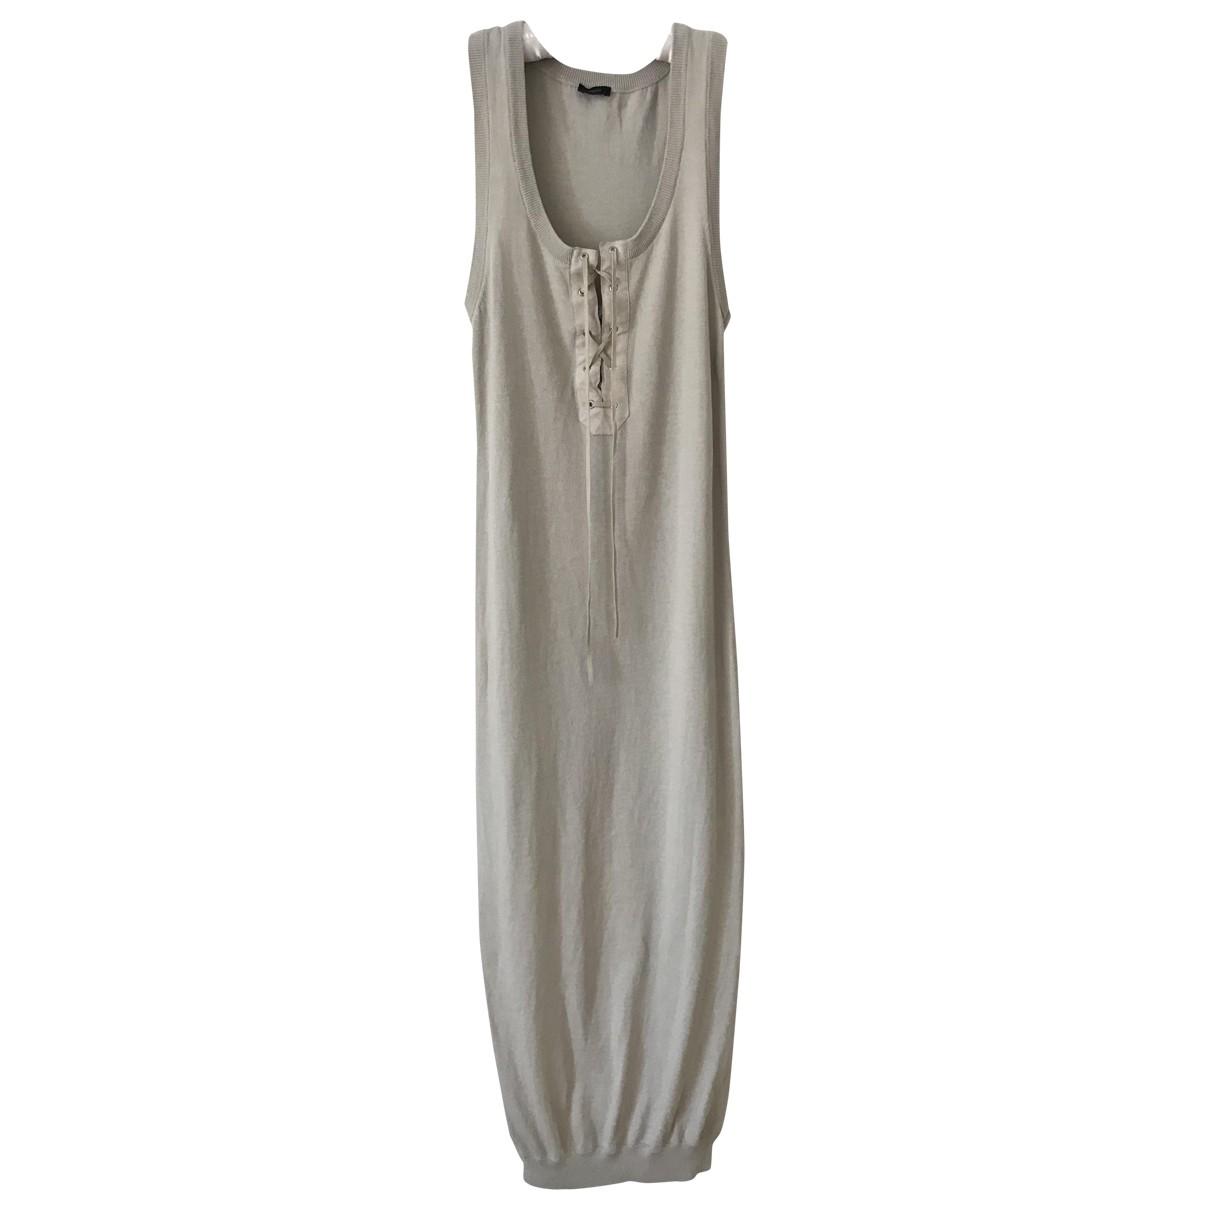 Joseph \N Beige Cotton dress for Women S International